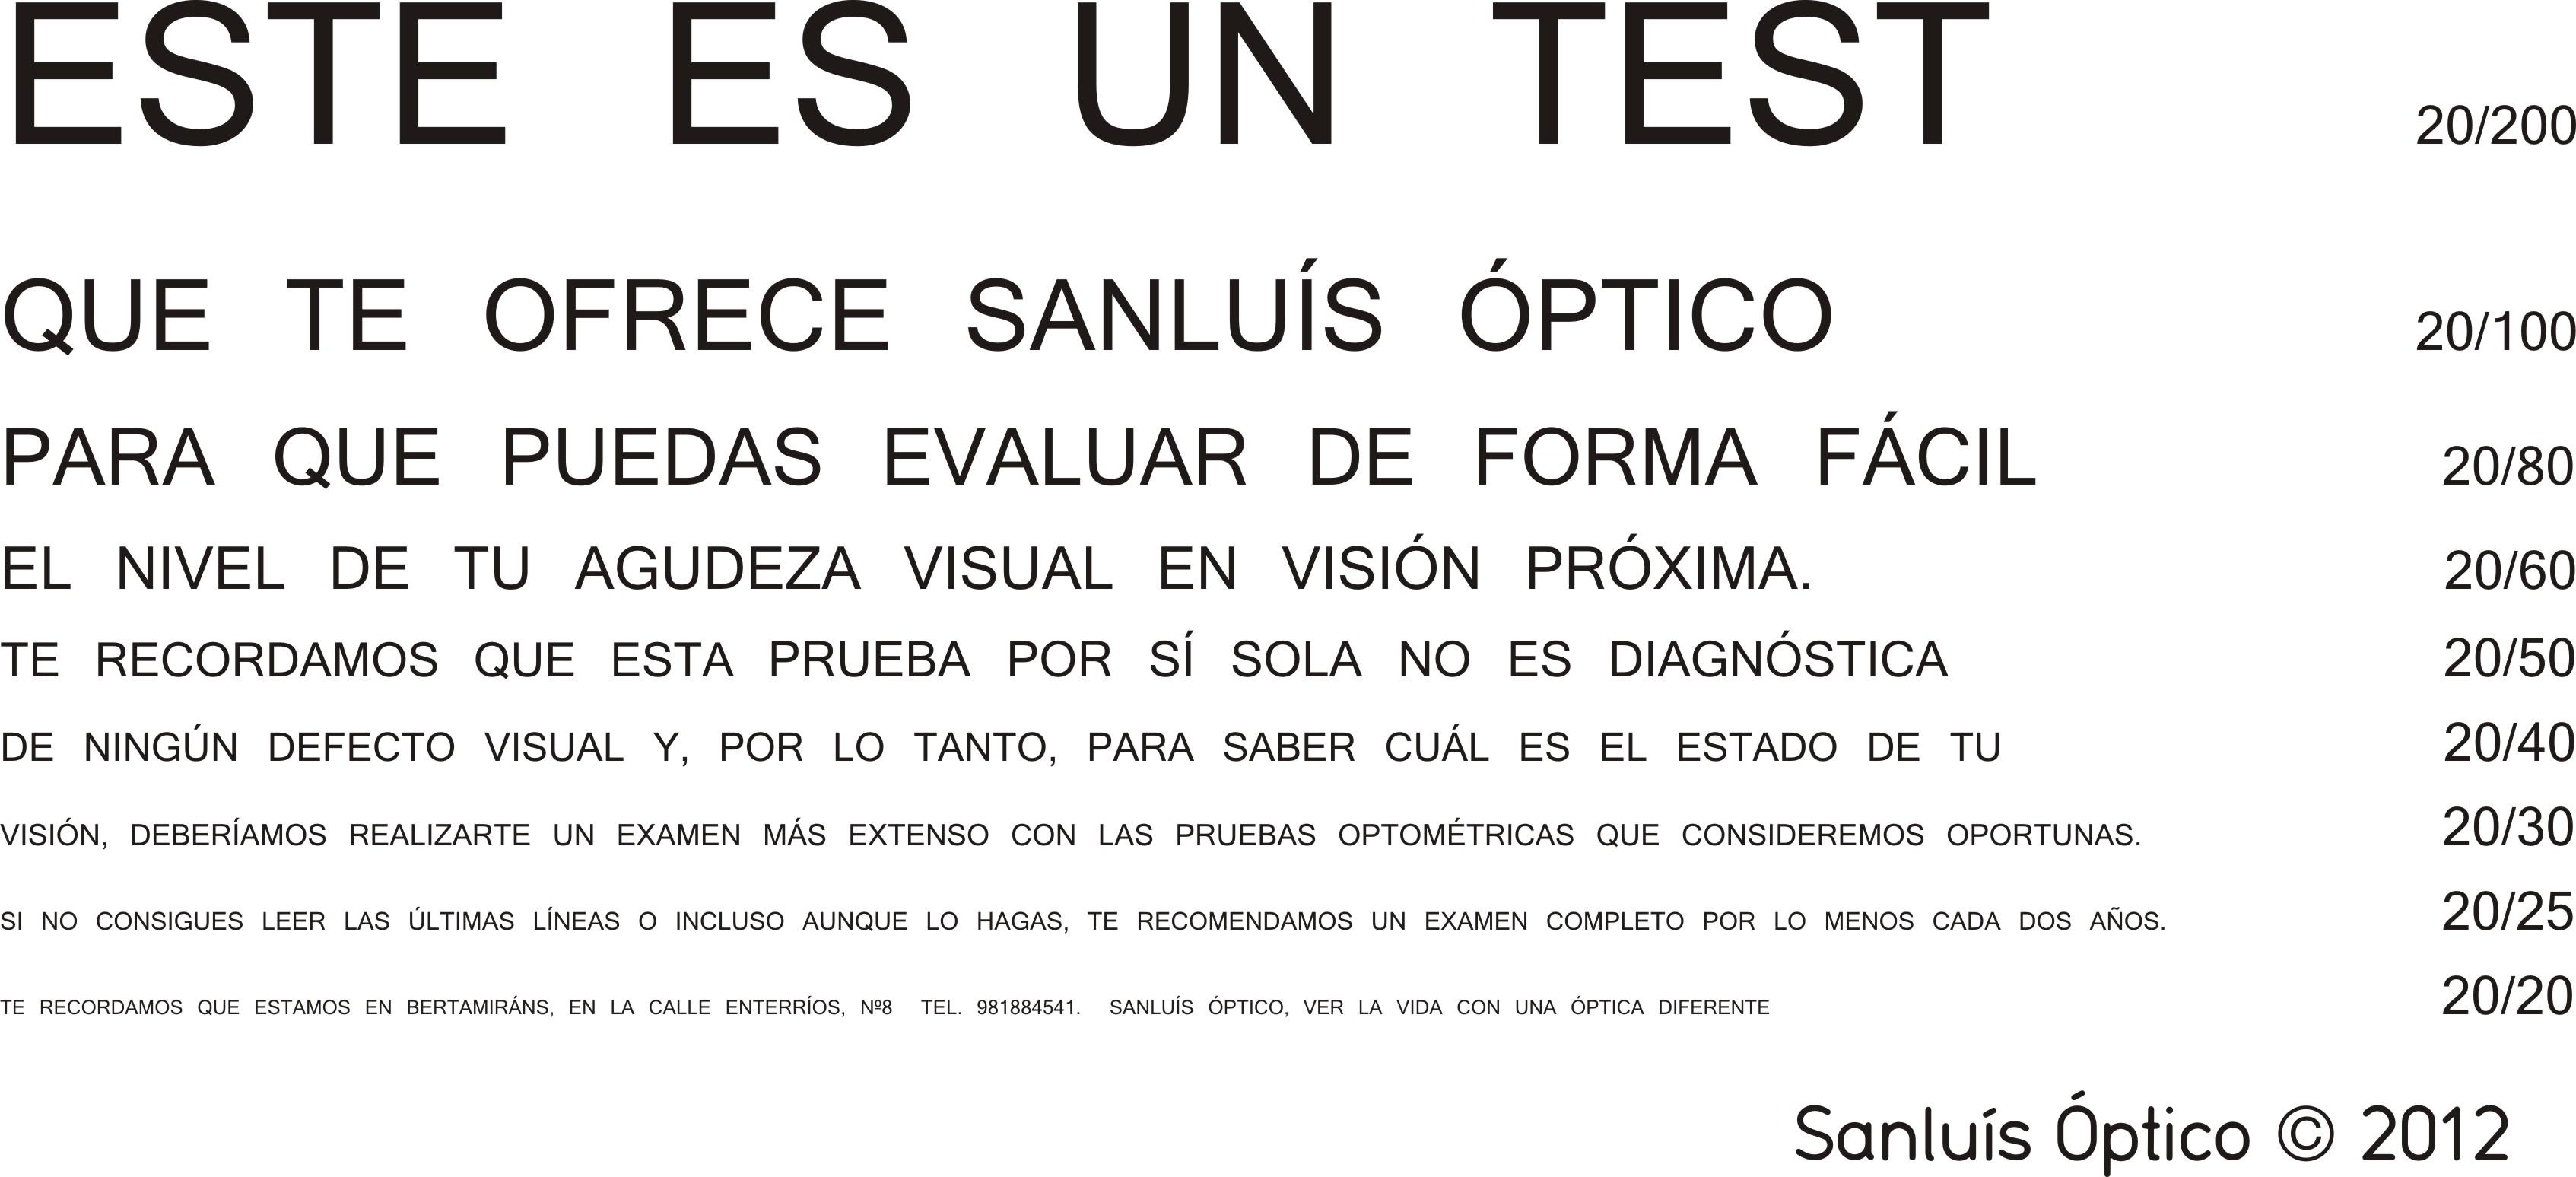 7b8db03422 Test de agudeza visual de visión próxima | Sanluis Optico